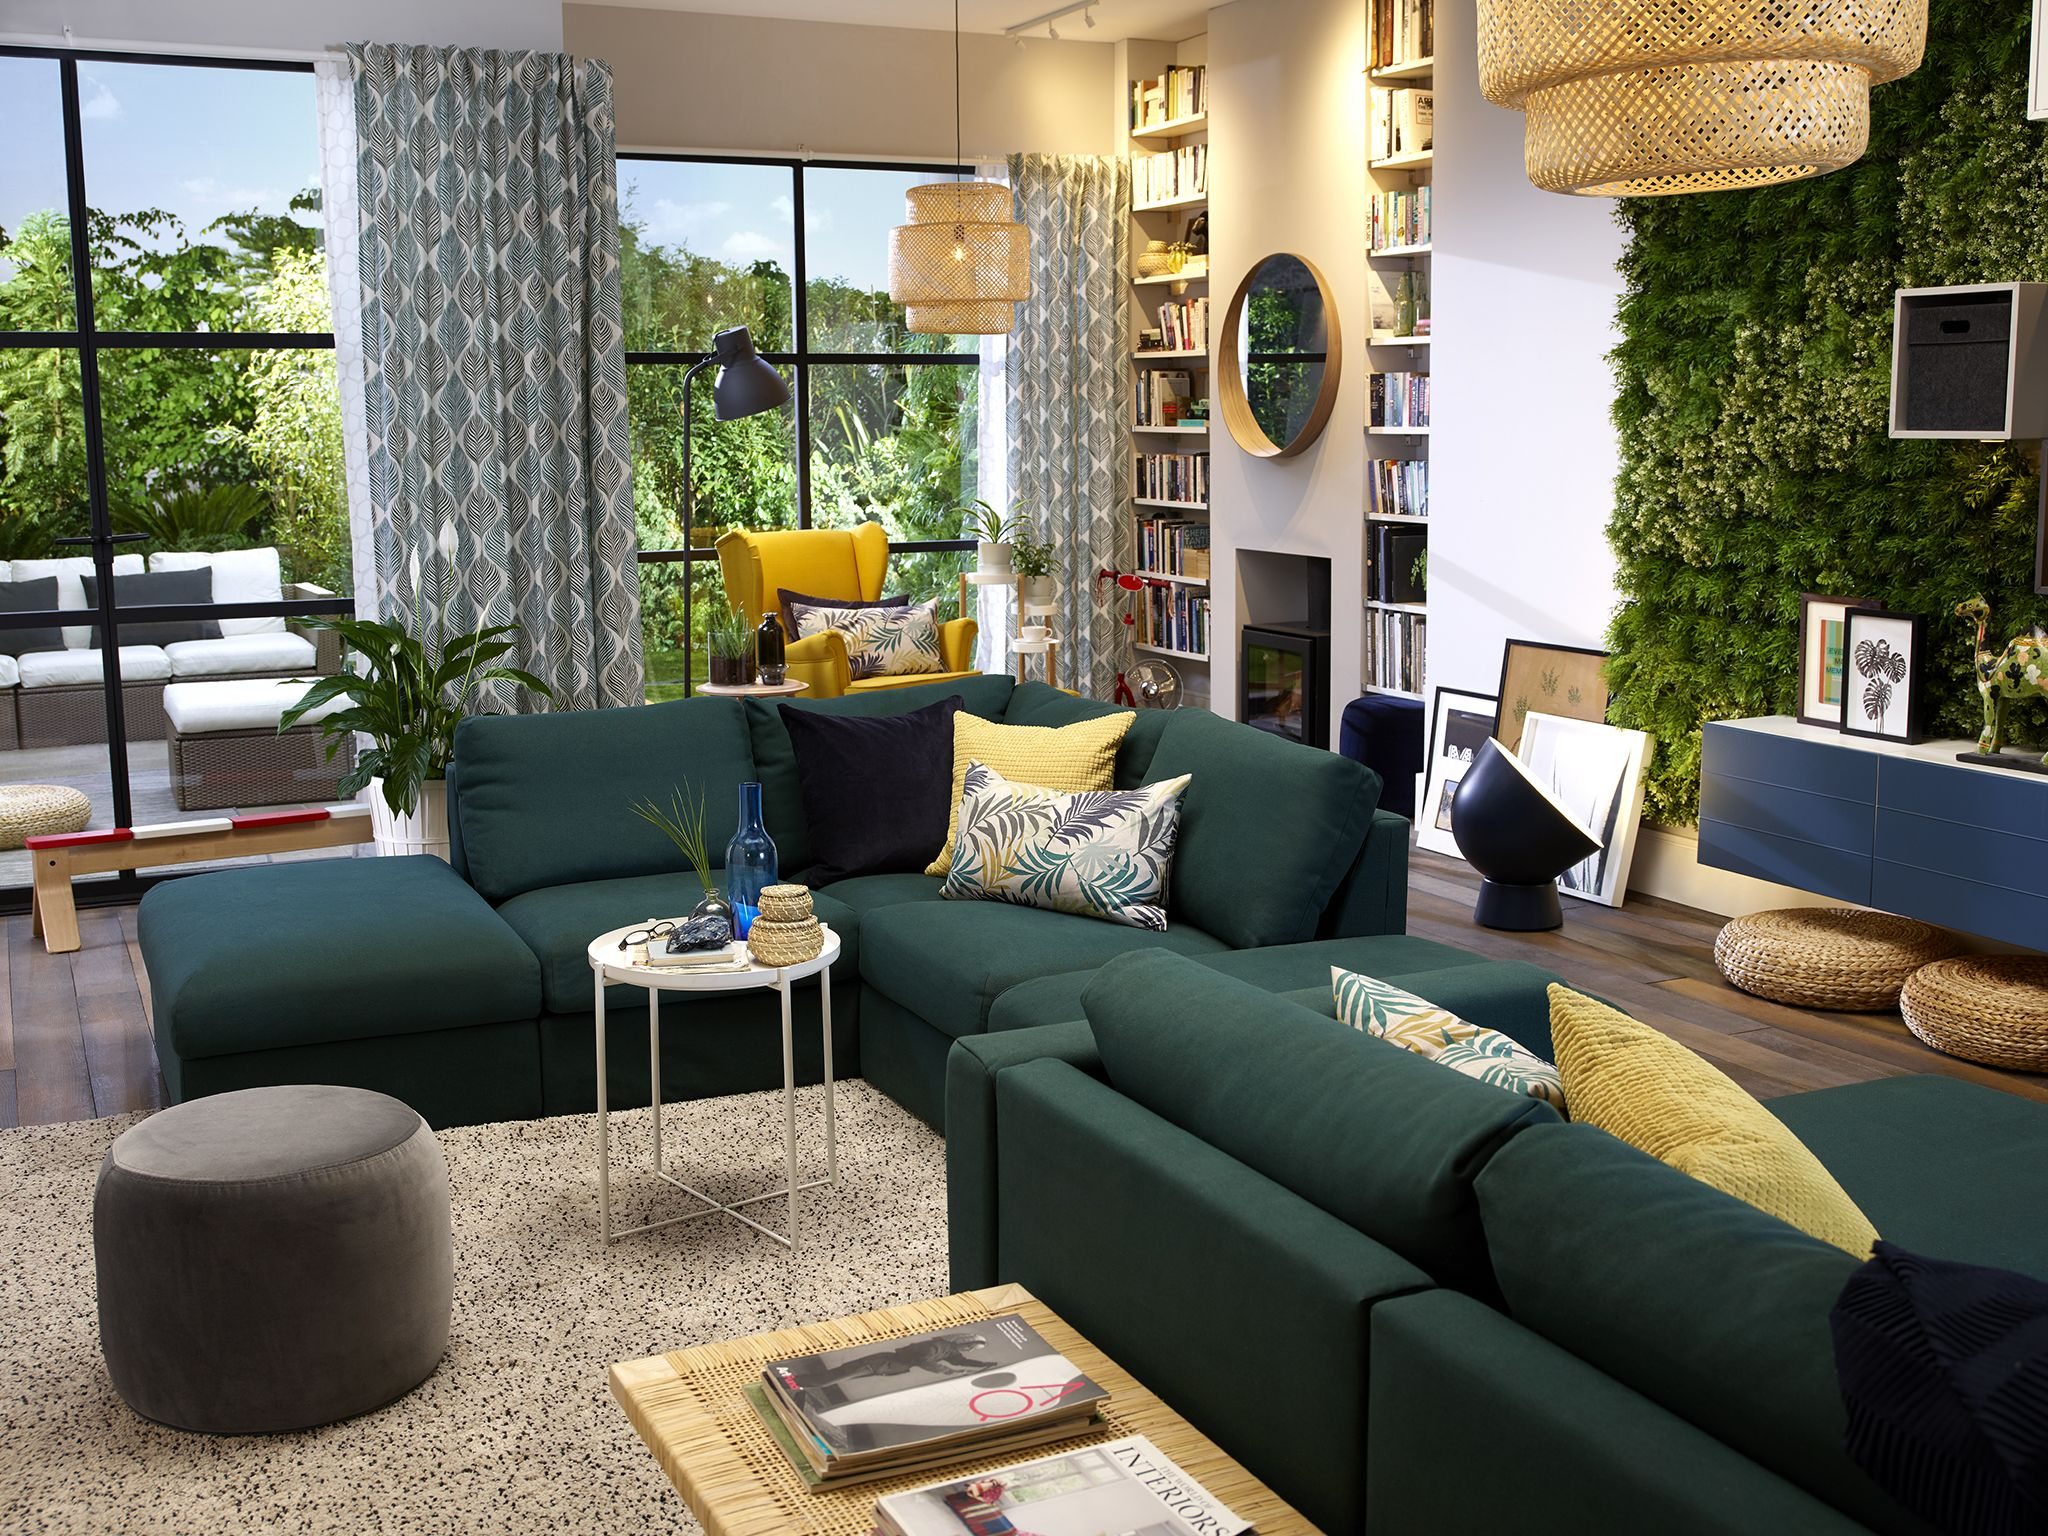 Image Result For Ikea Vimle Sofa Green Living Room Ikea Living